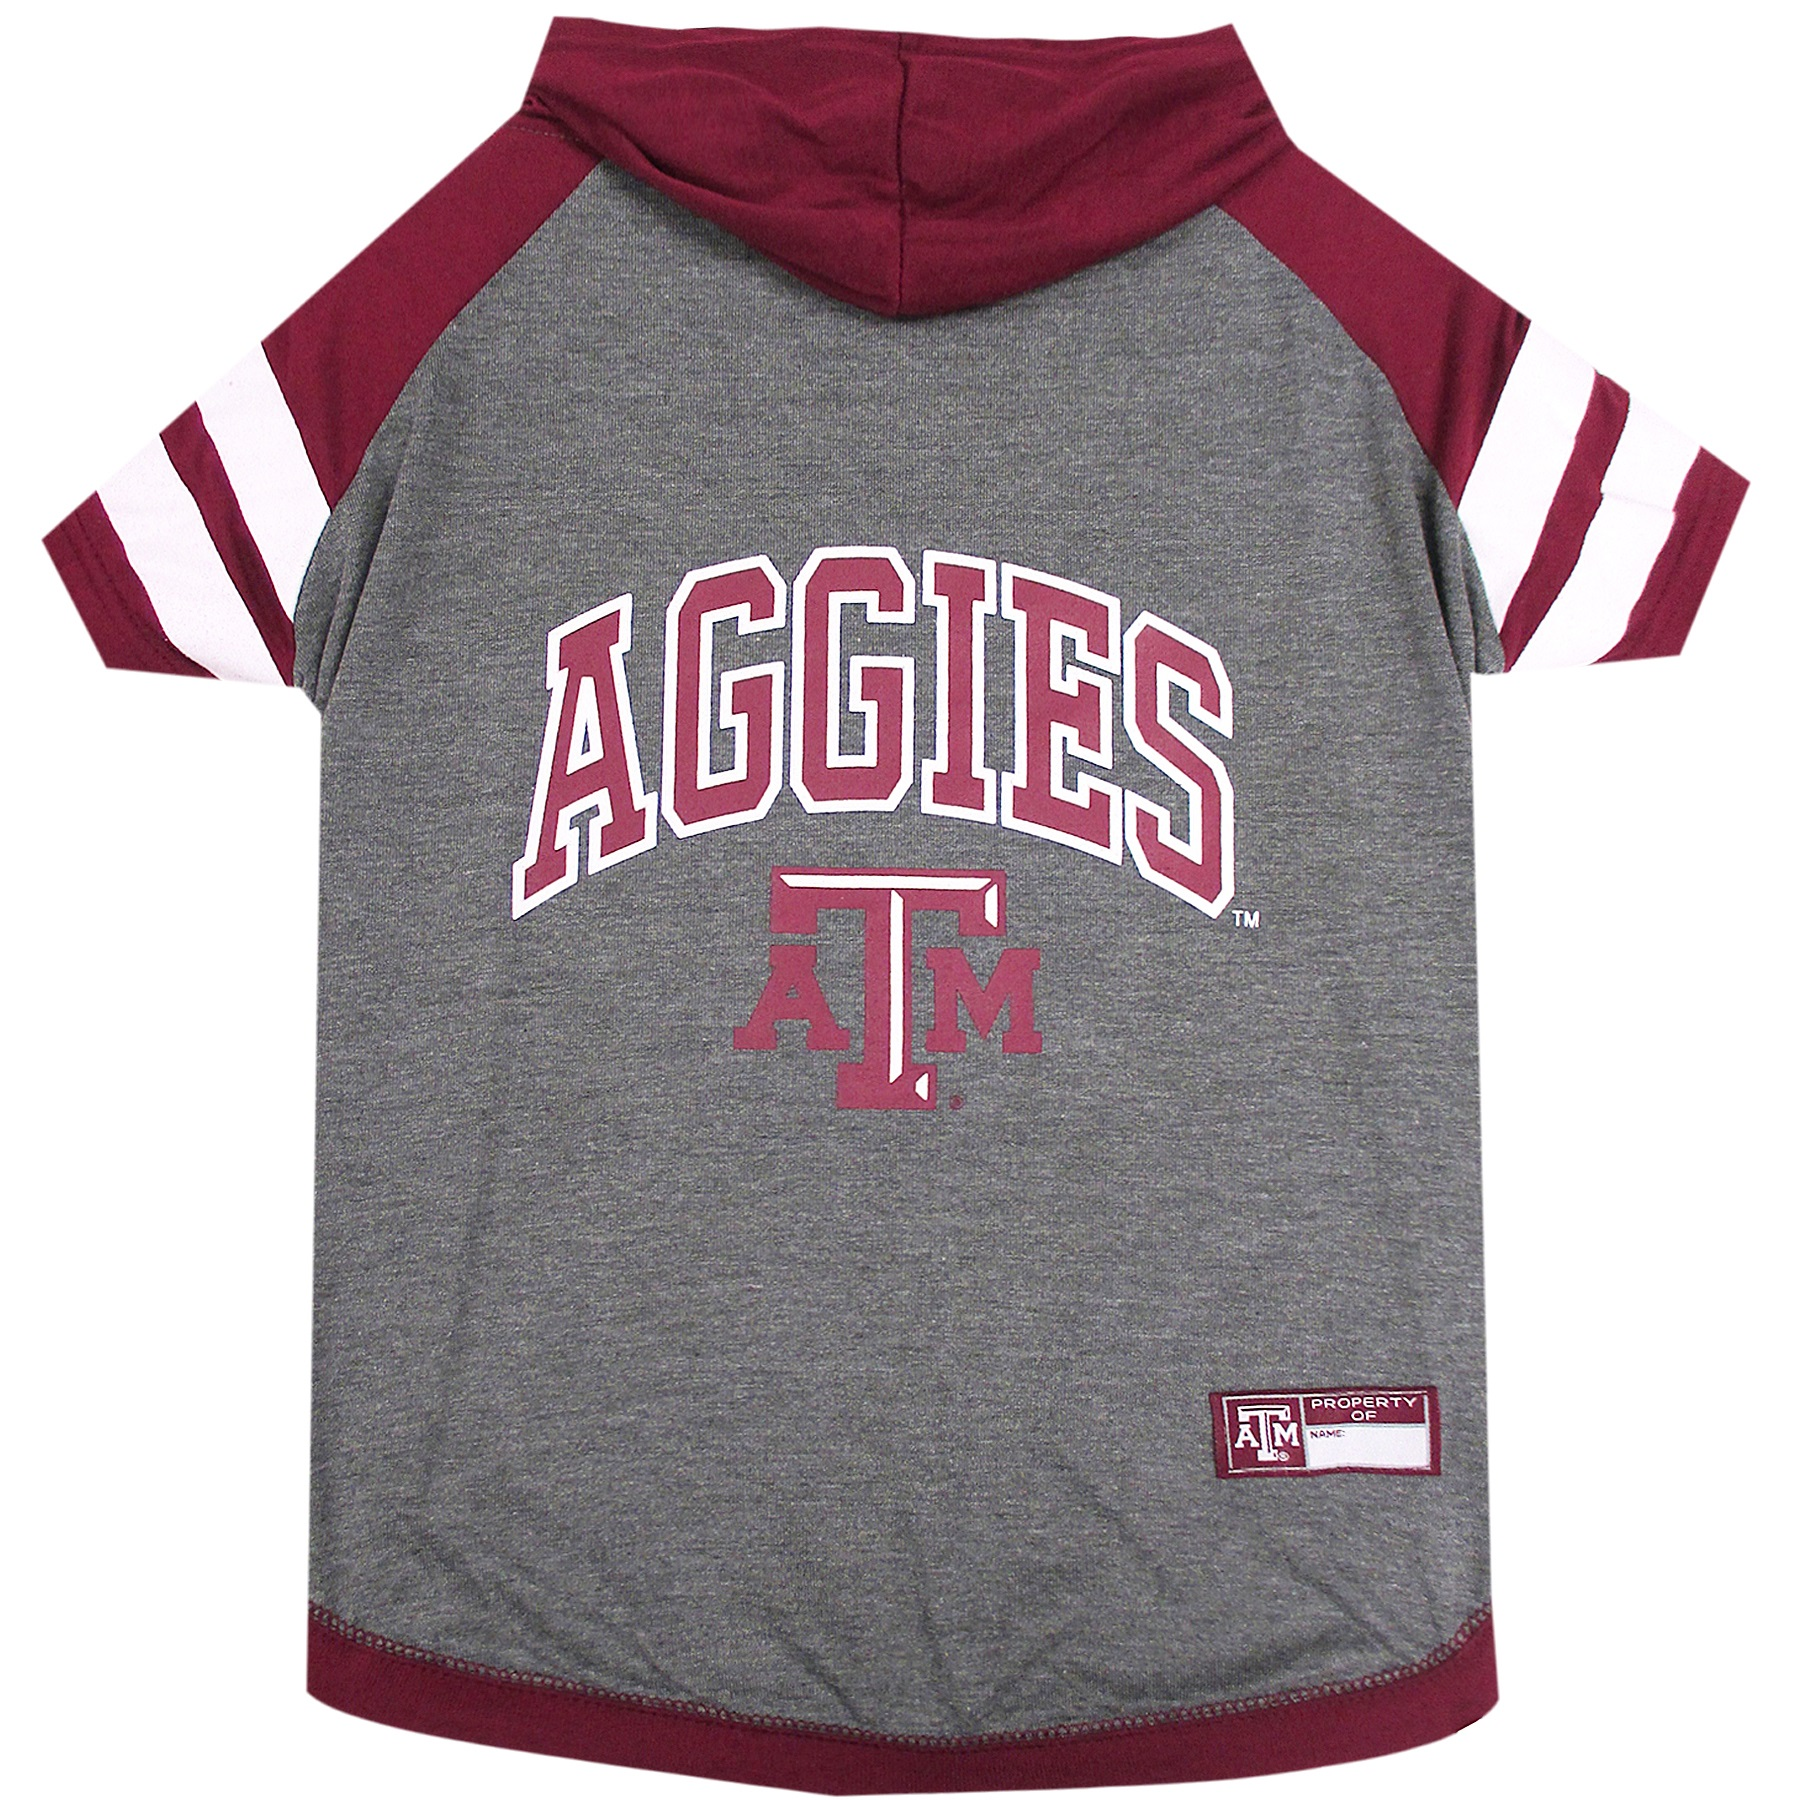 Texas A&M University Doggy Hooded Tee-Shirt